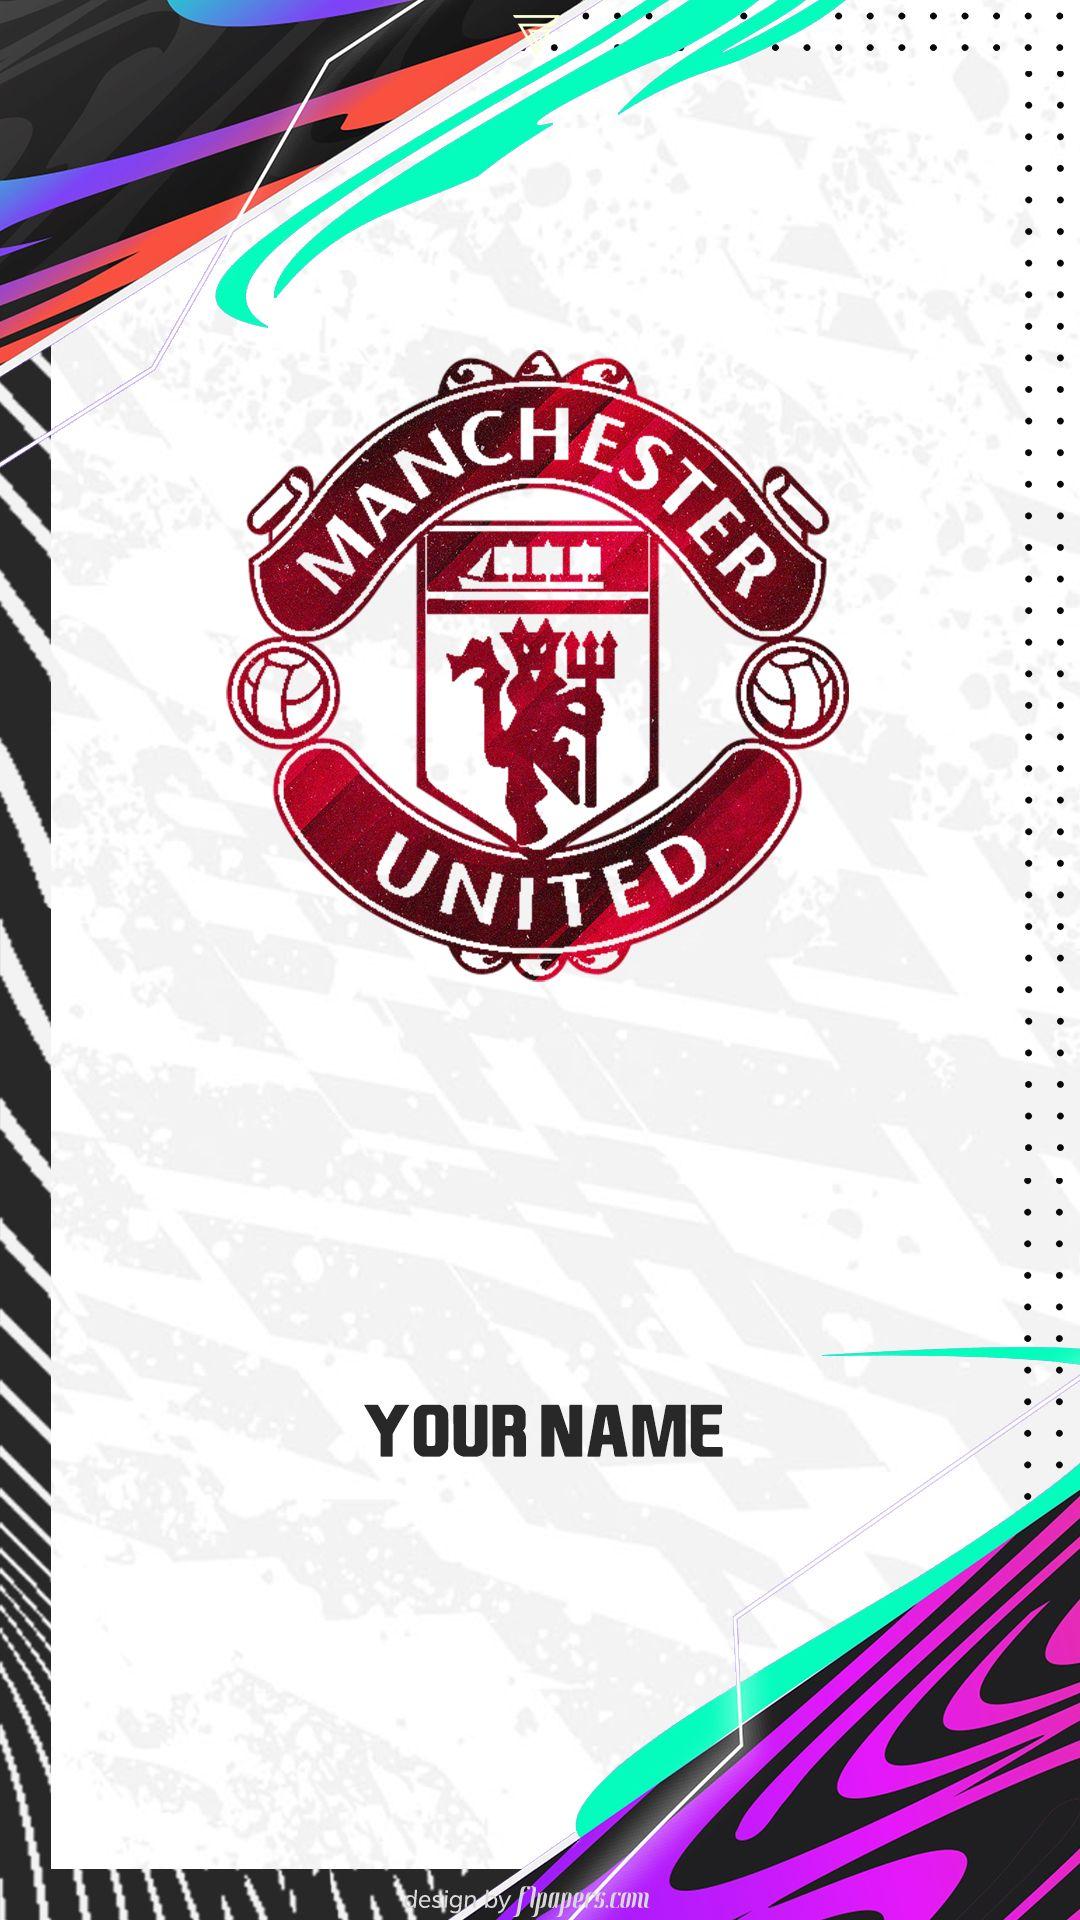 Manchester United 2020 Sepak Bola Olahraga